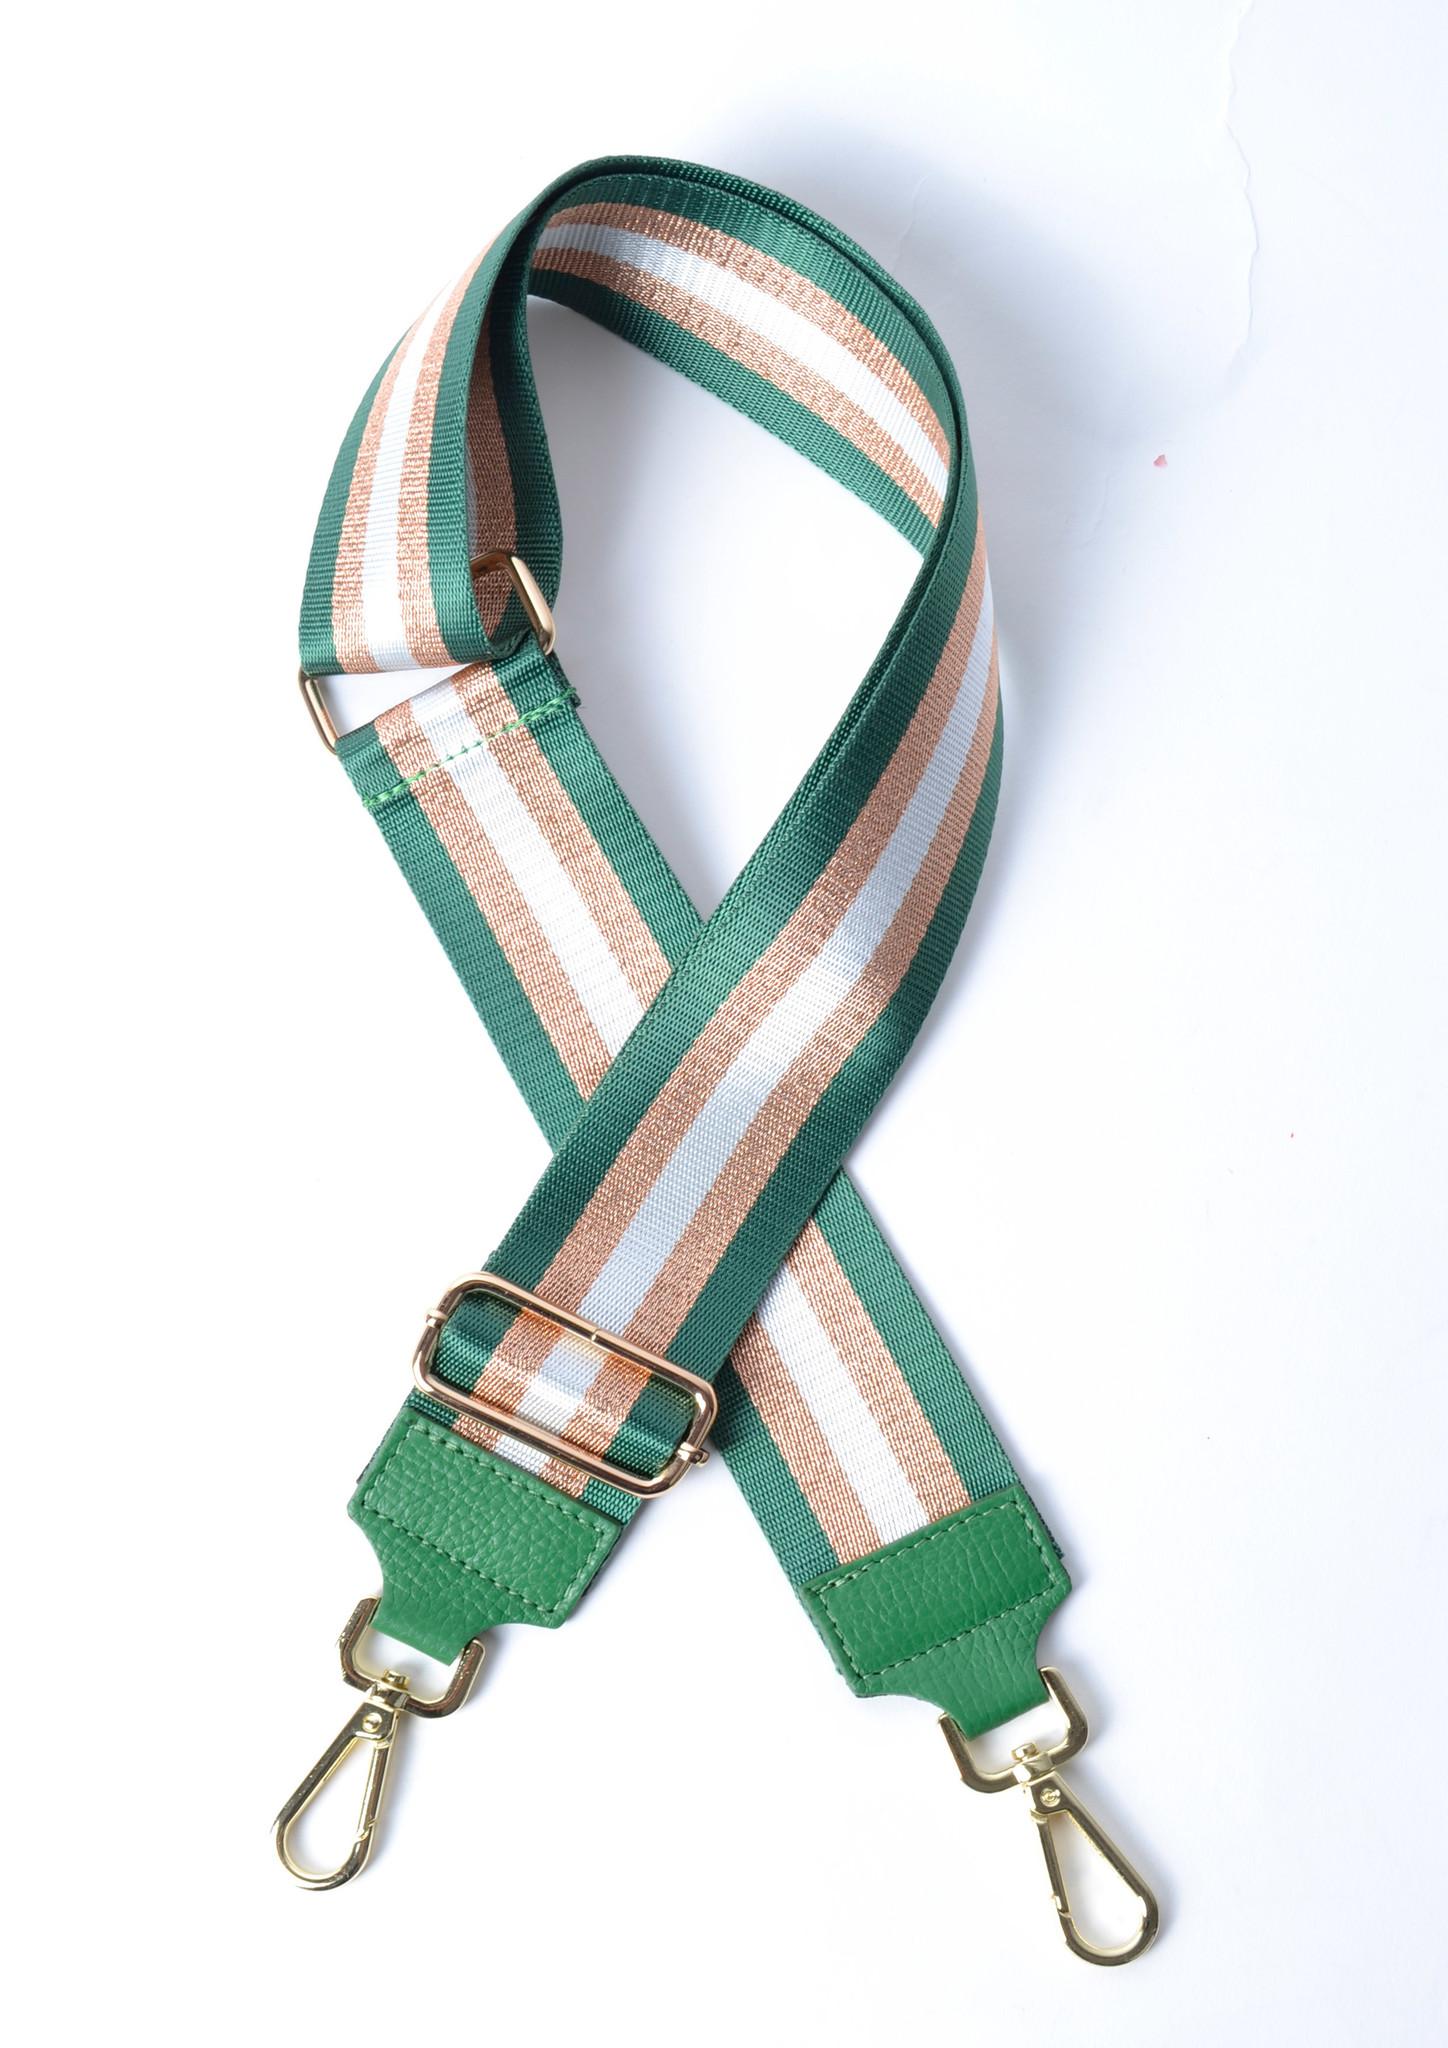 Tassenhengsel Special Lines groen groene goud leer leren tassenhengsels losse hengsels kopen bestellen bagstraps